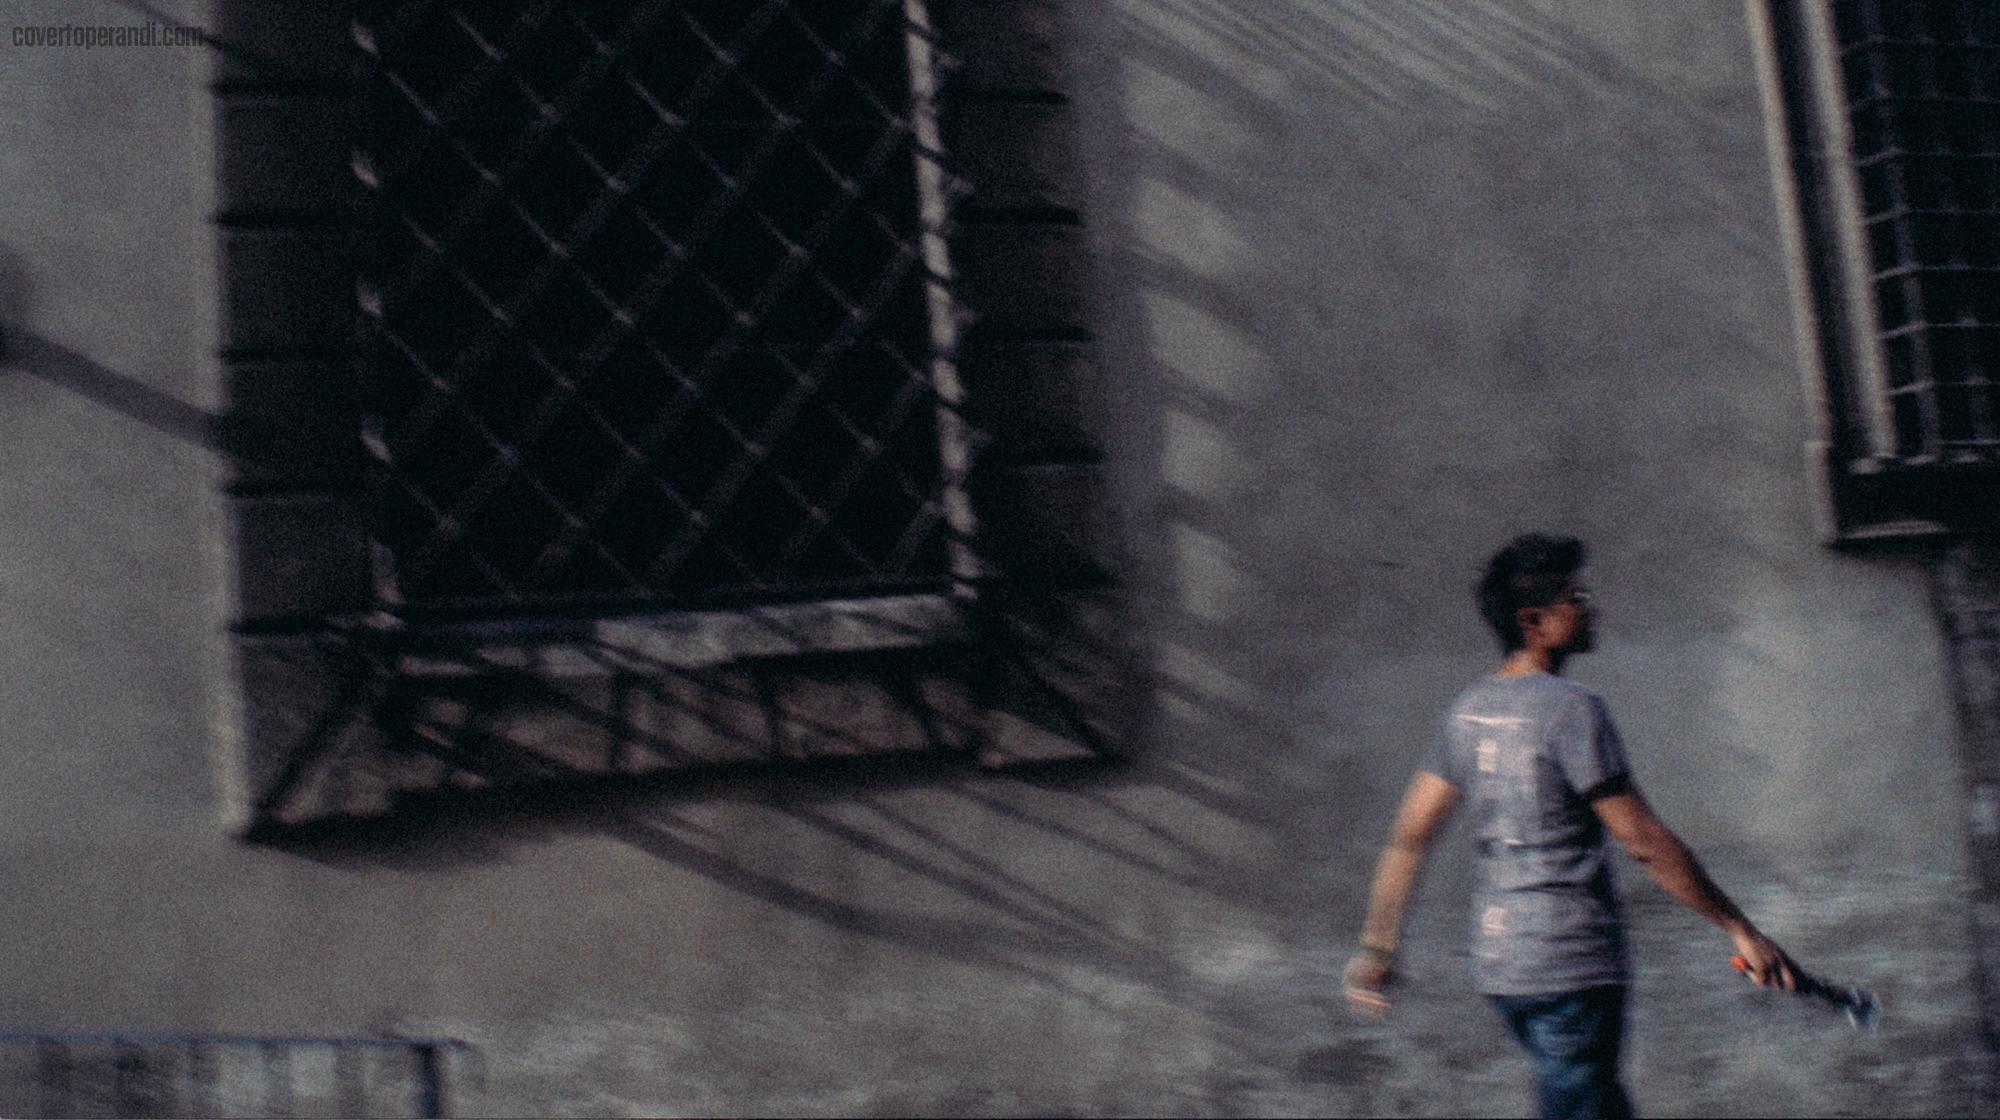 Covert Operandi - 2014 Florence-34.jpg